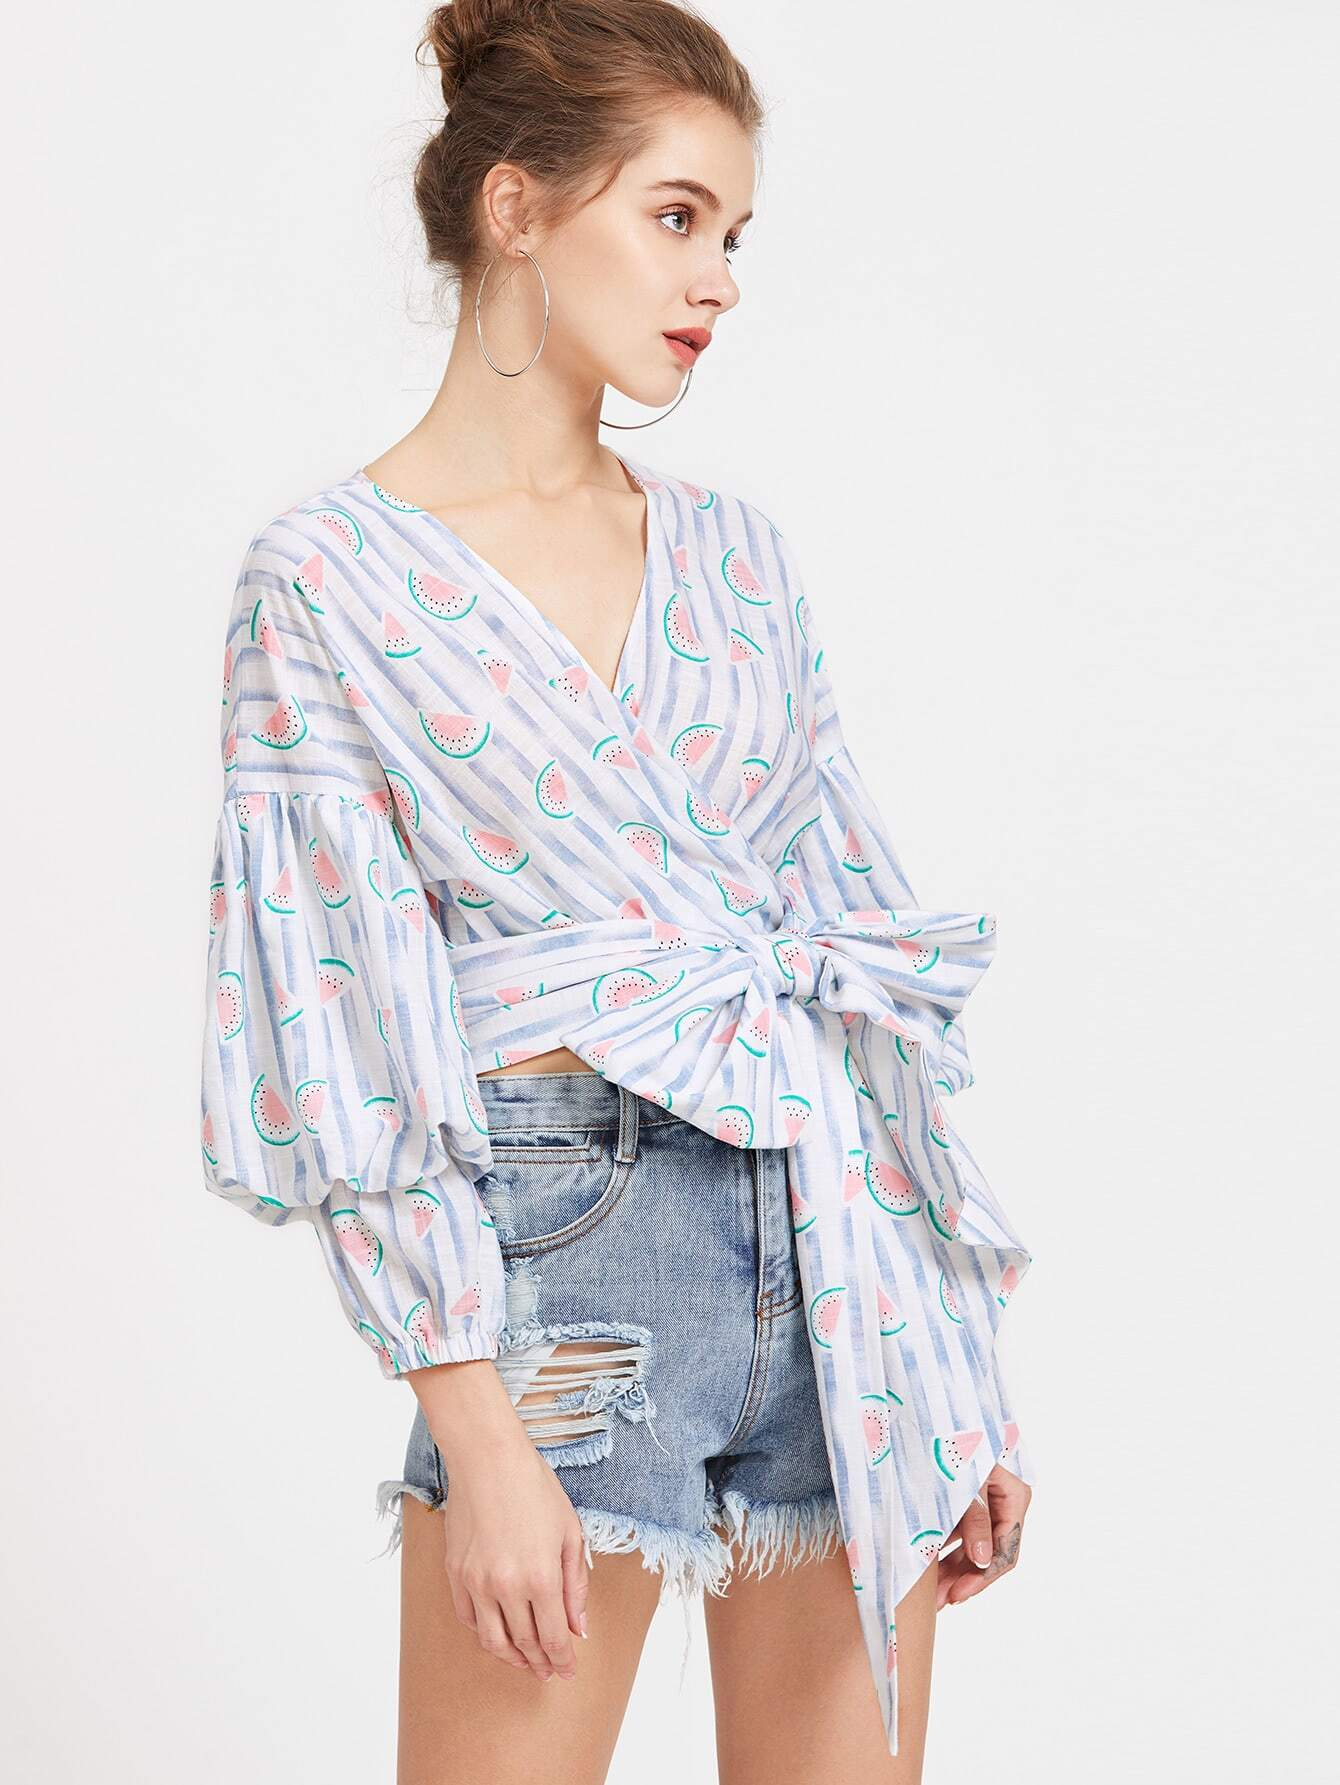 blouse170328706_2